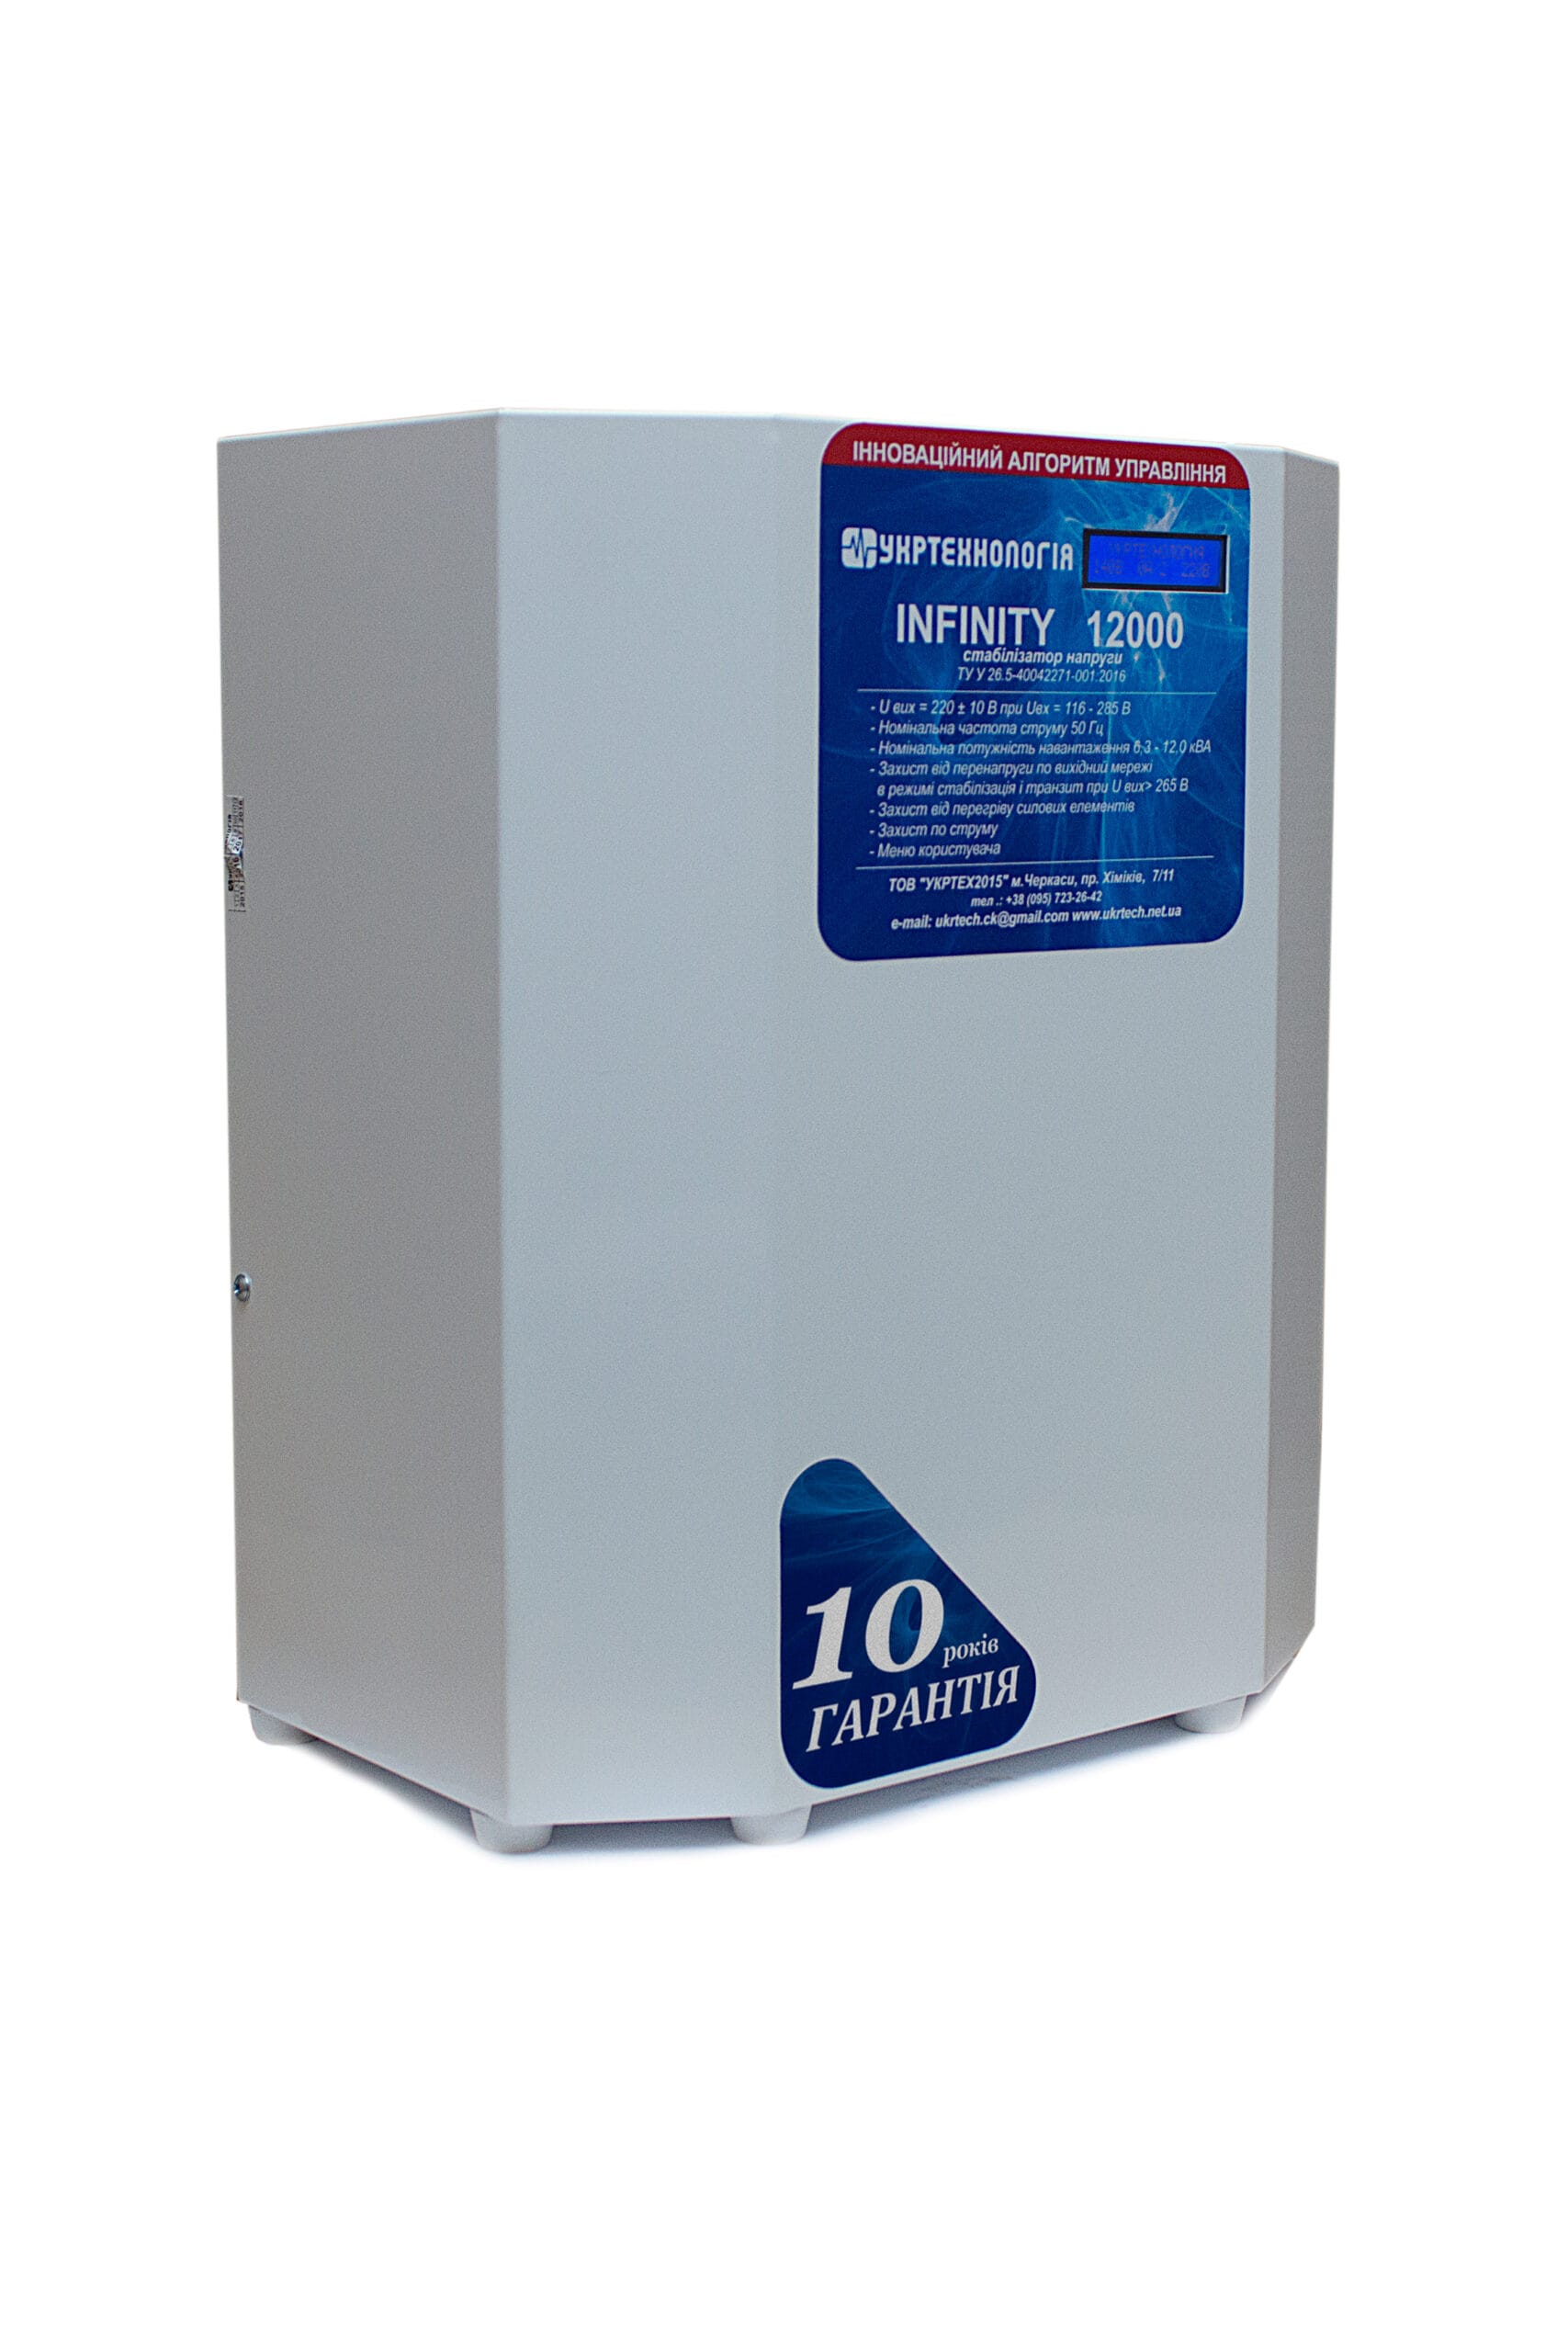 Стабилизаторы напряжения - Стабилизатор напряжения 12 кВт INFINITY 000001413 - Фото 1